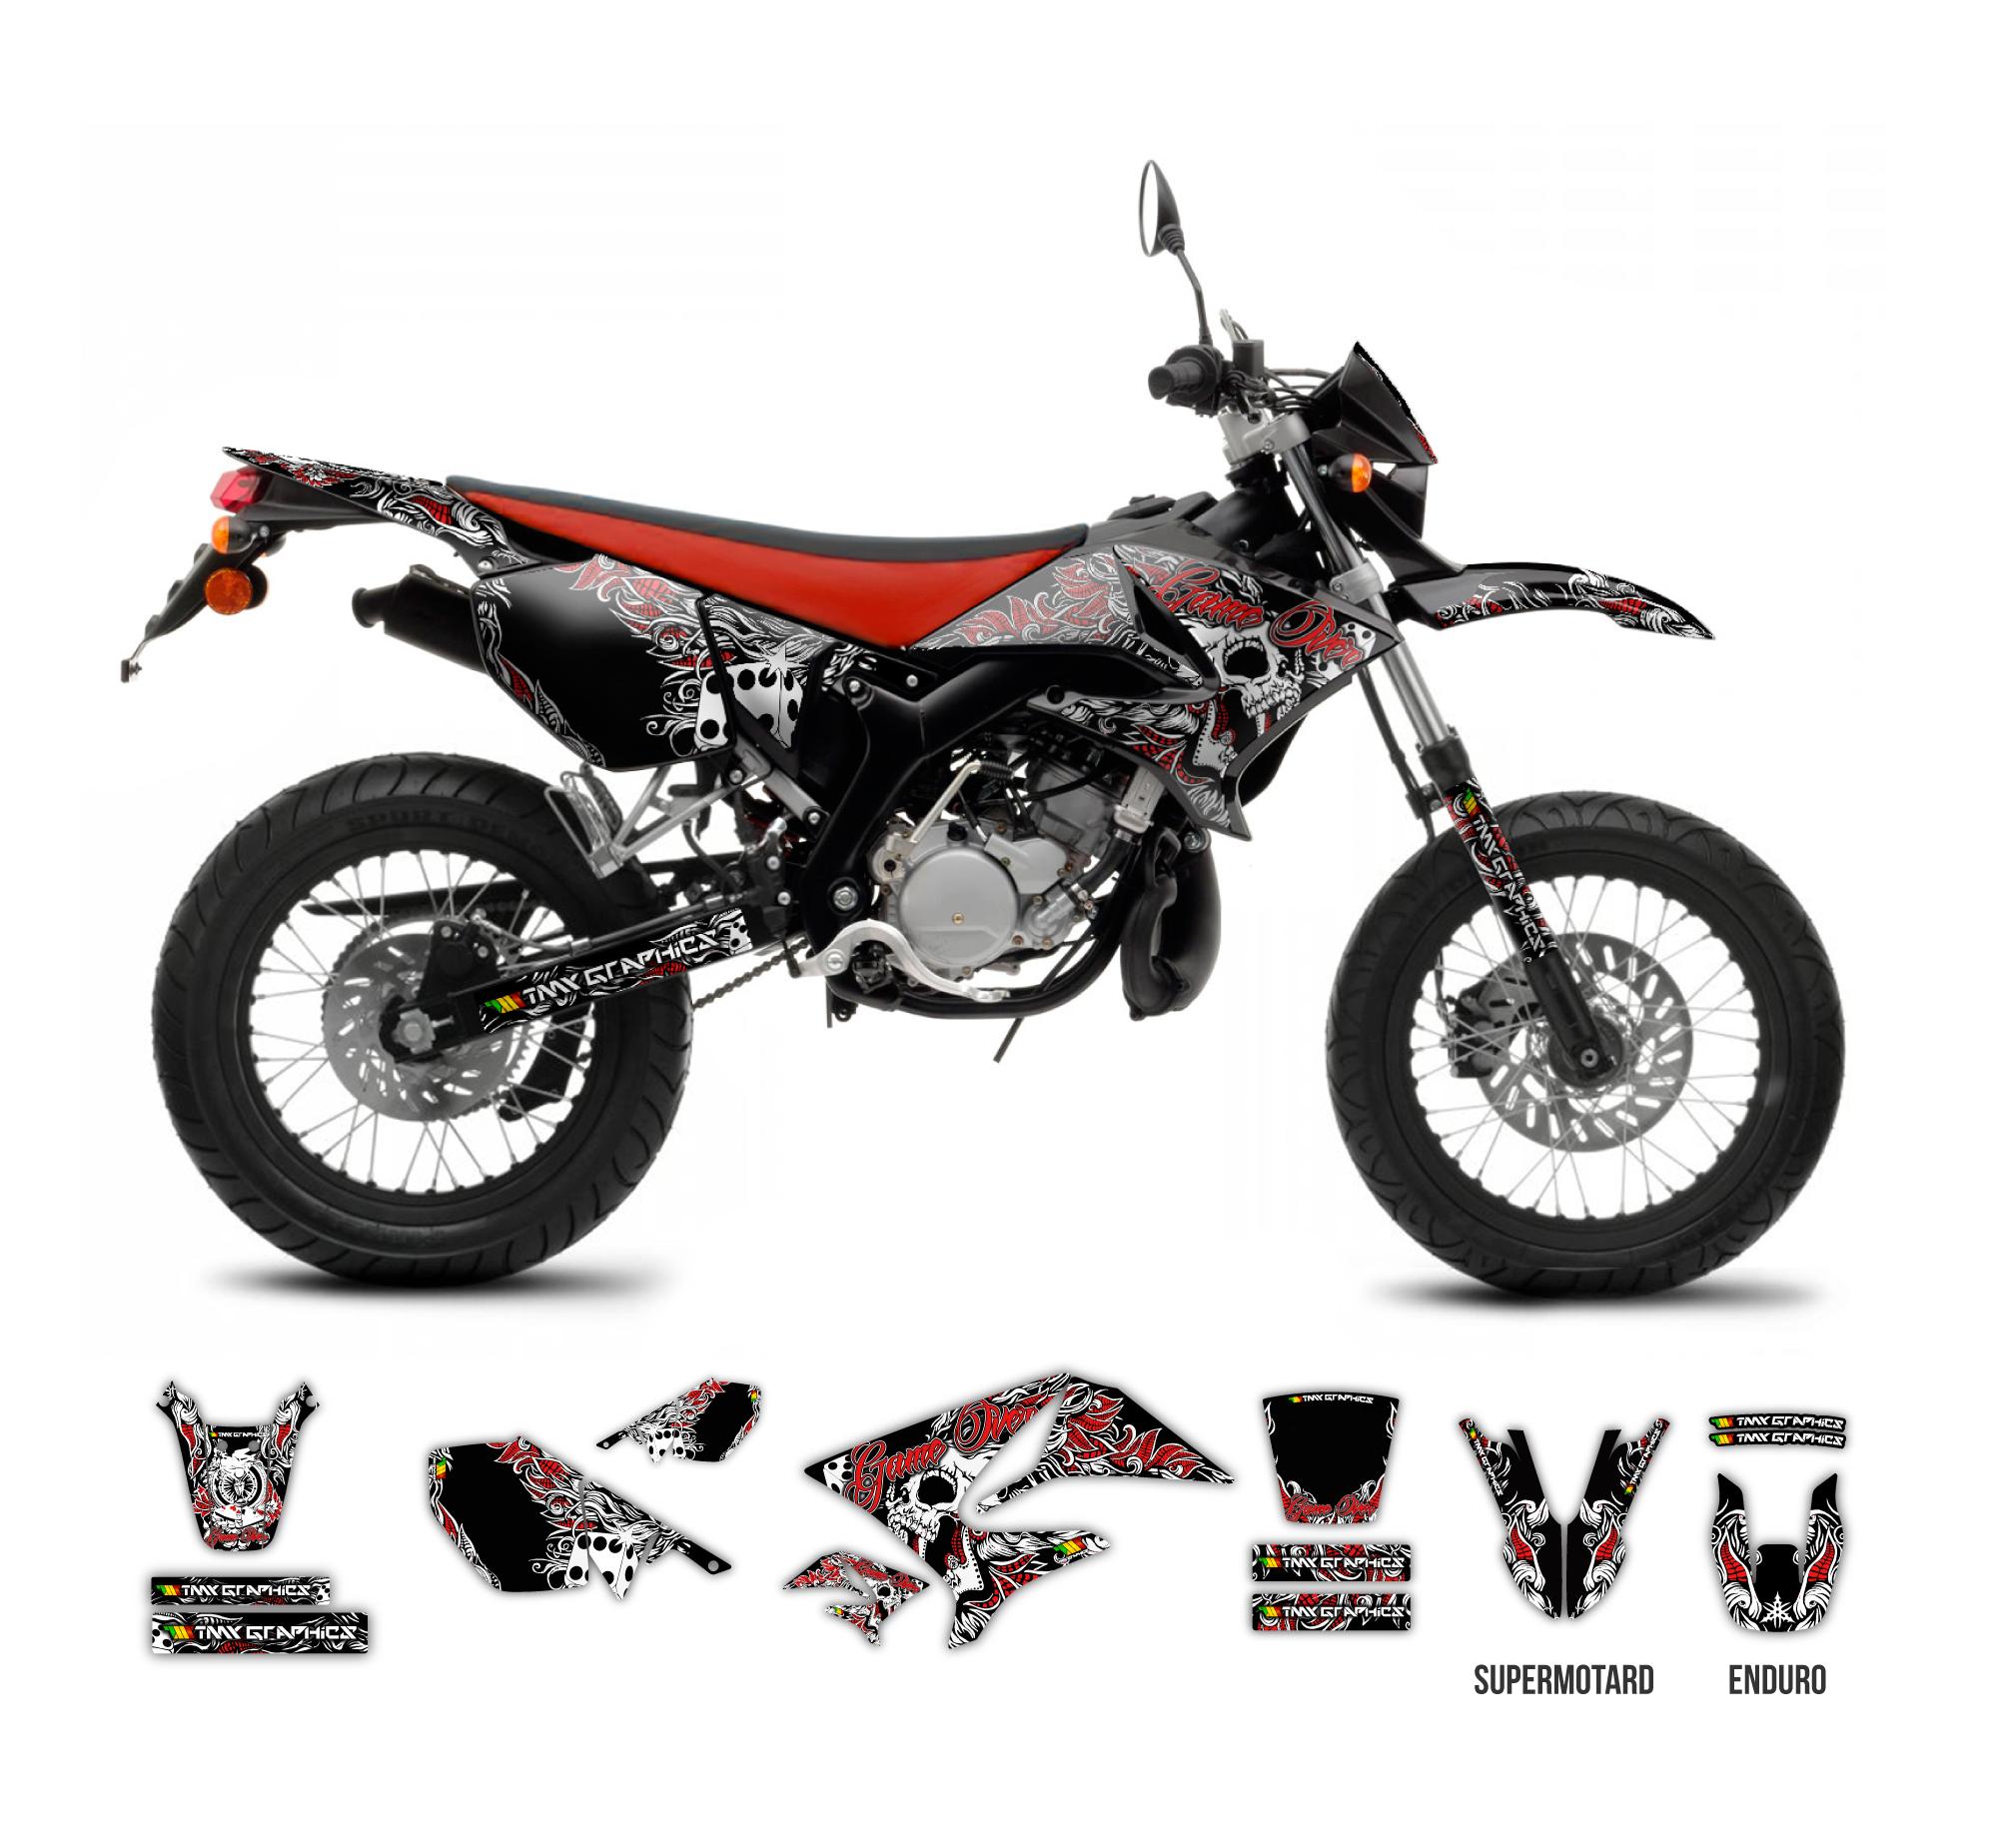 YAMAHA DT 125 RE/X - Rockstar Fox Graphics Series | TMX